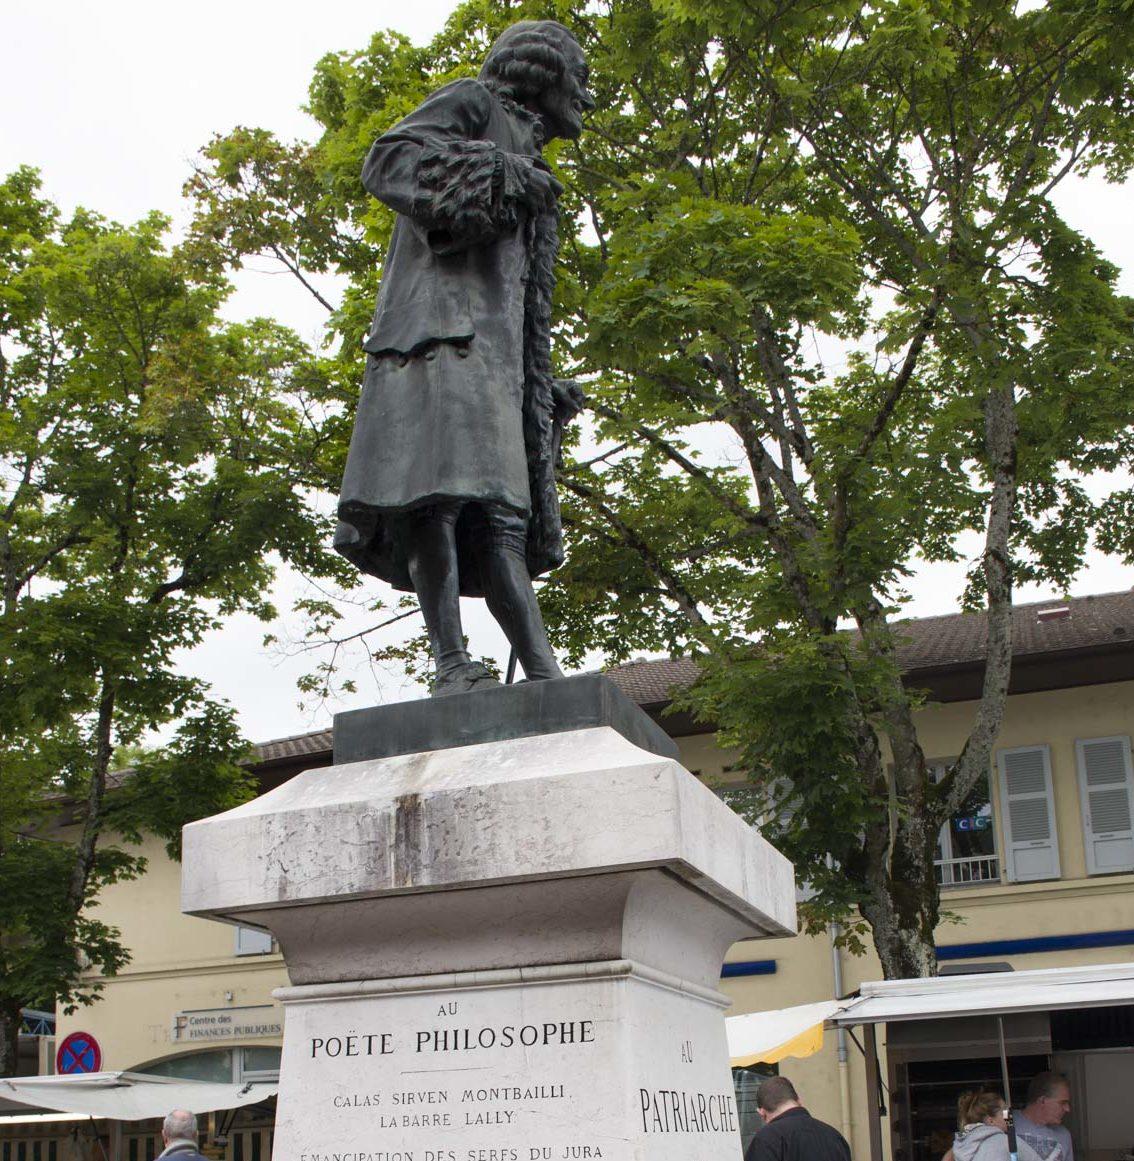 poet and philosopher Voltaire